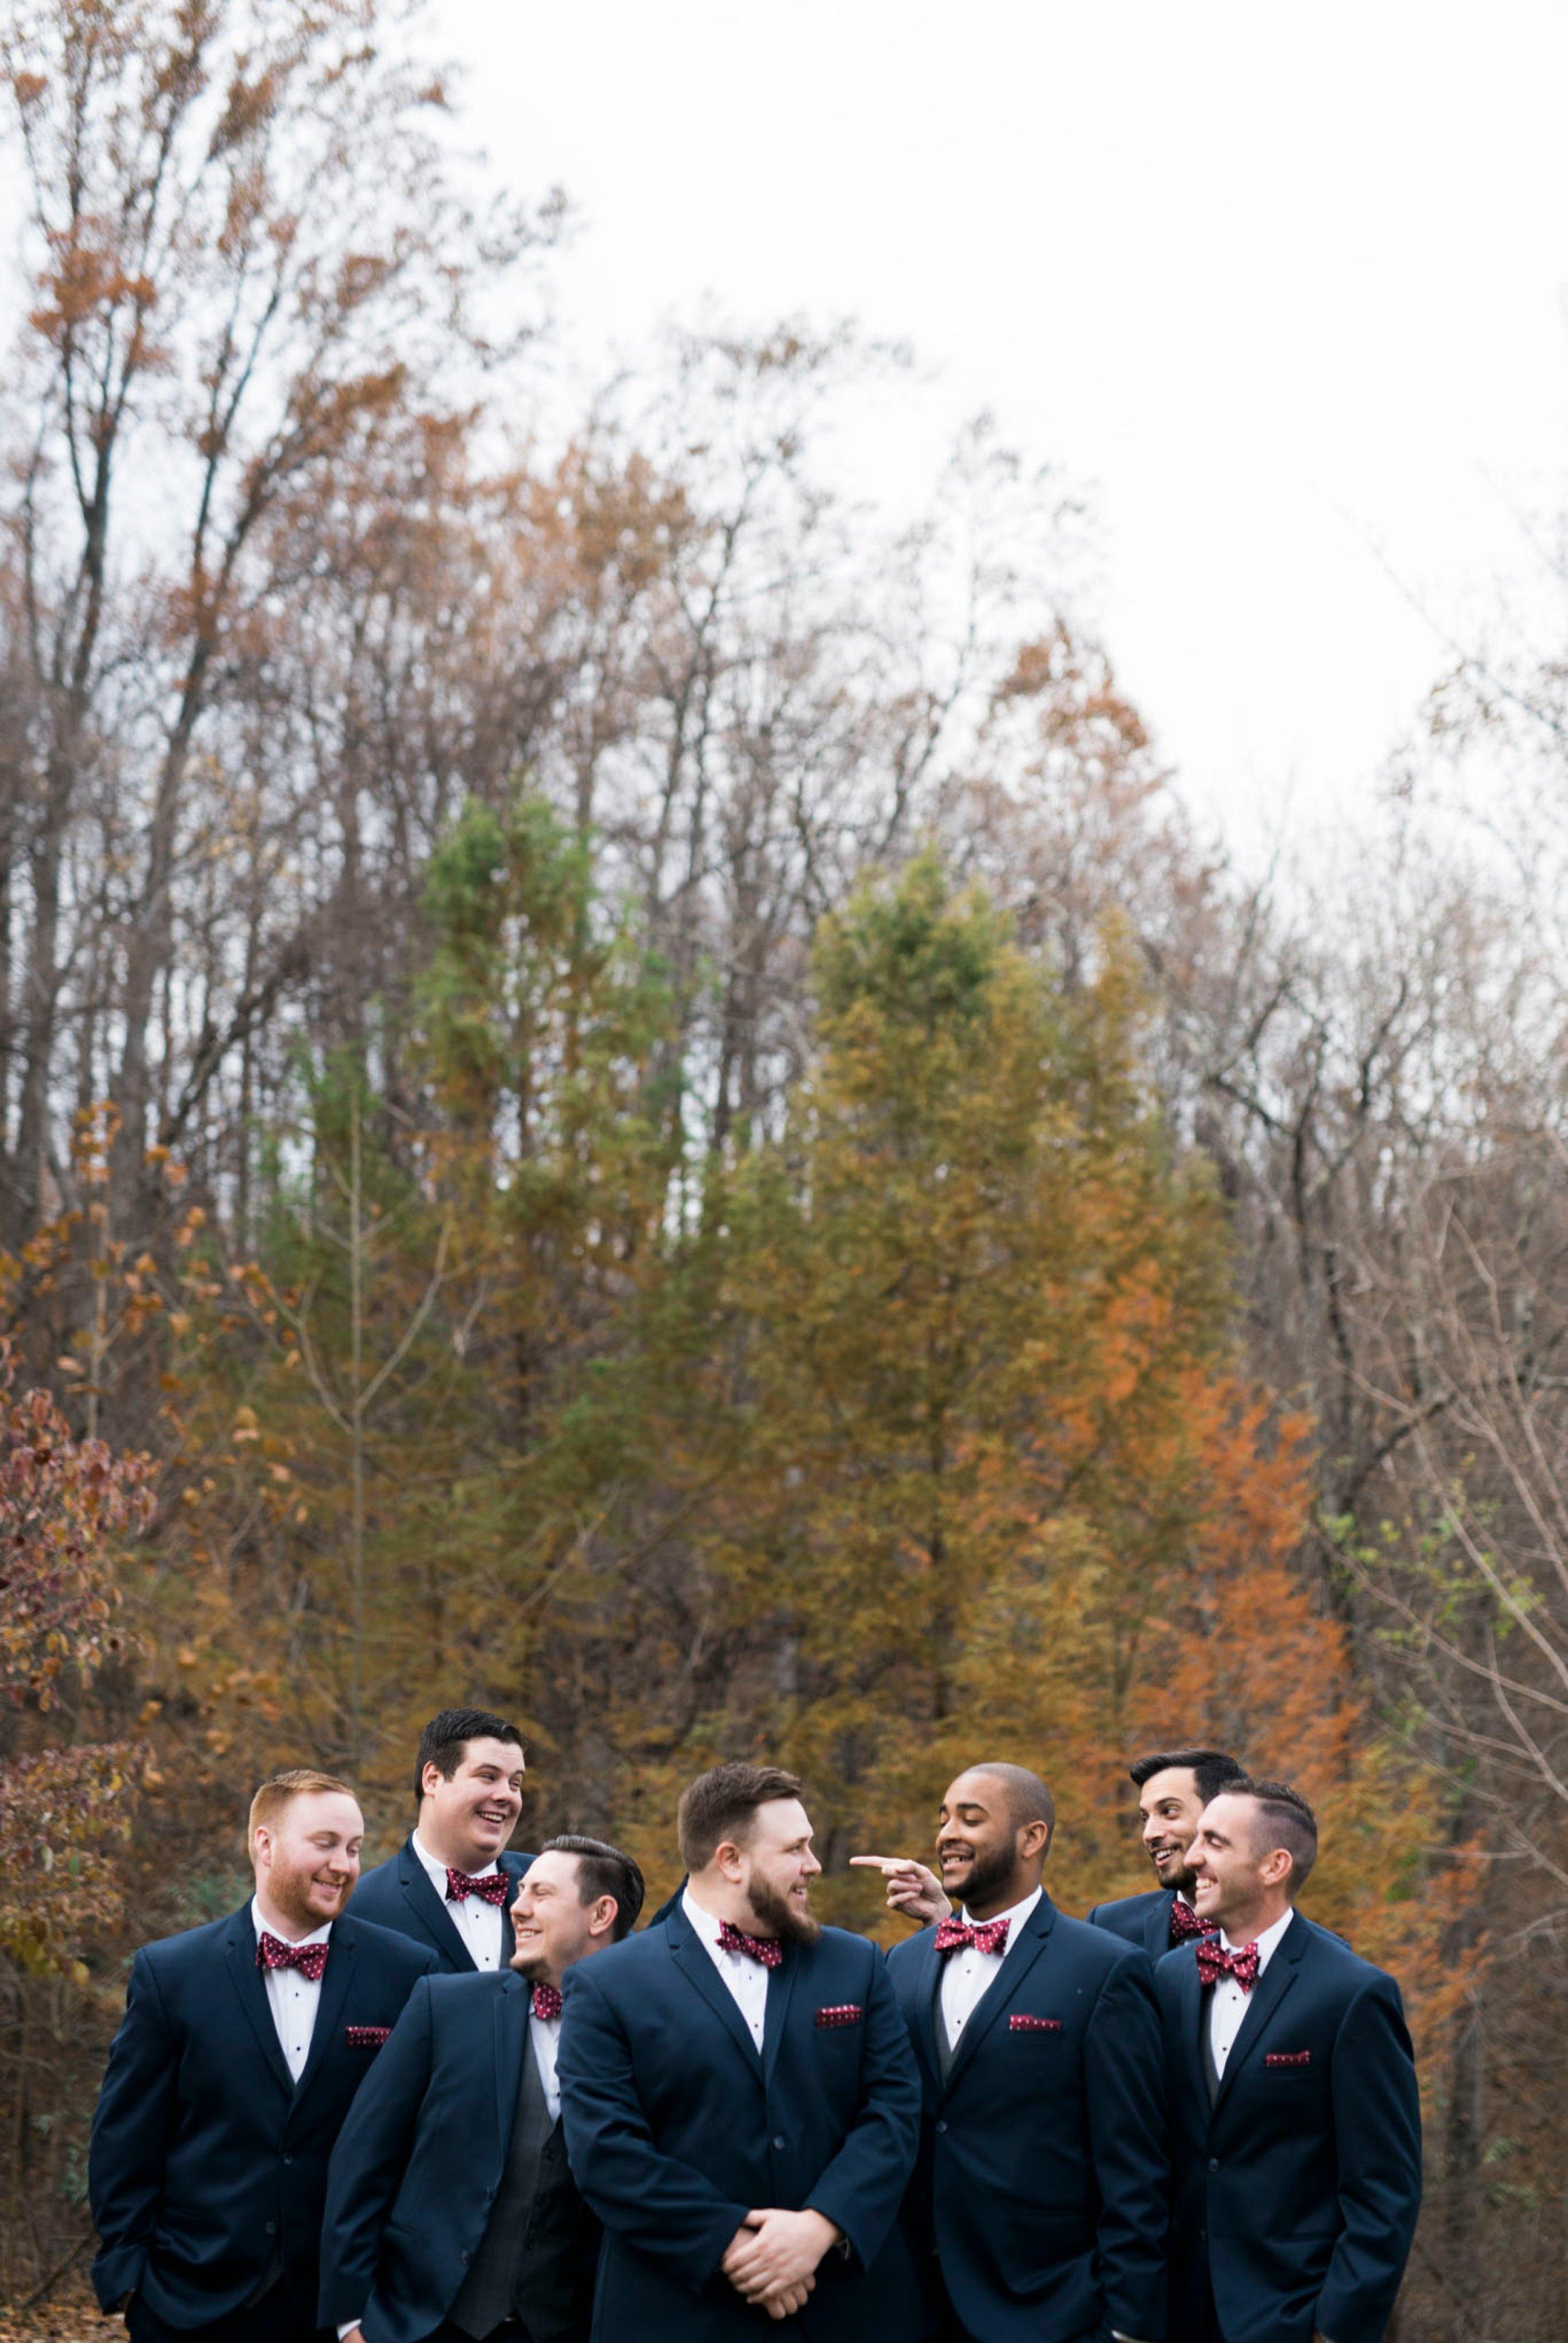 IrvineEstate_LexingtonVA_Wedding_FallWedding_VirginiaWeddingPhotographer 31.jpg